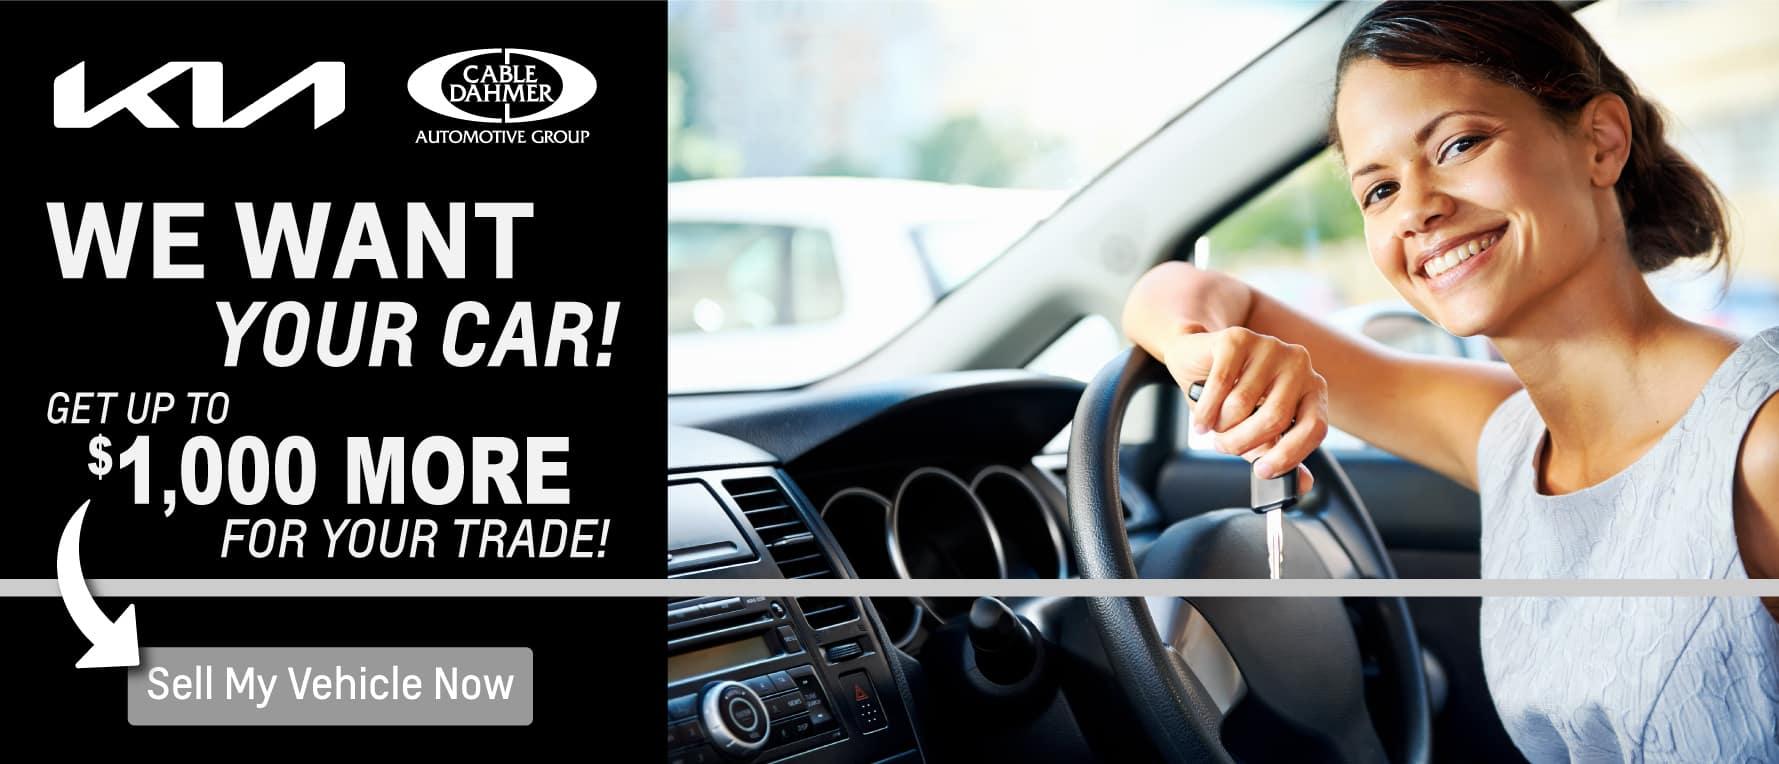 CD-July website Rotators-KIA_Website Rotator-cash for car